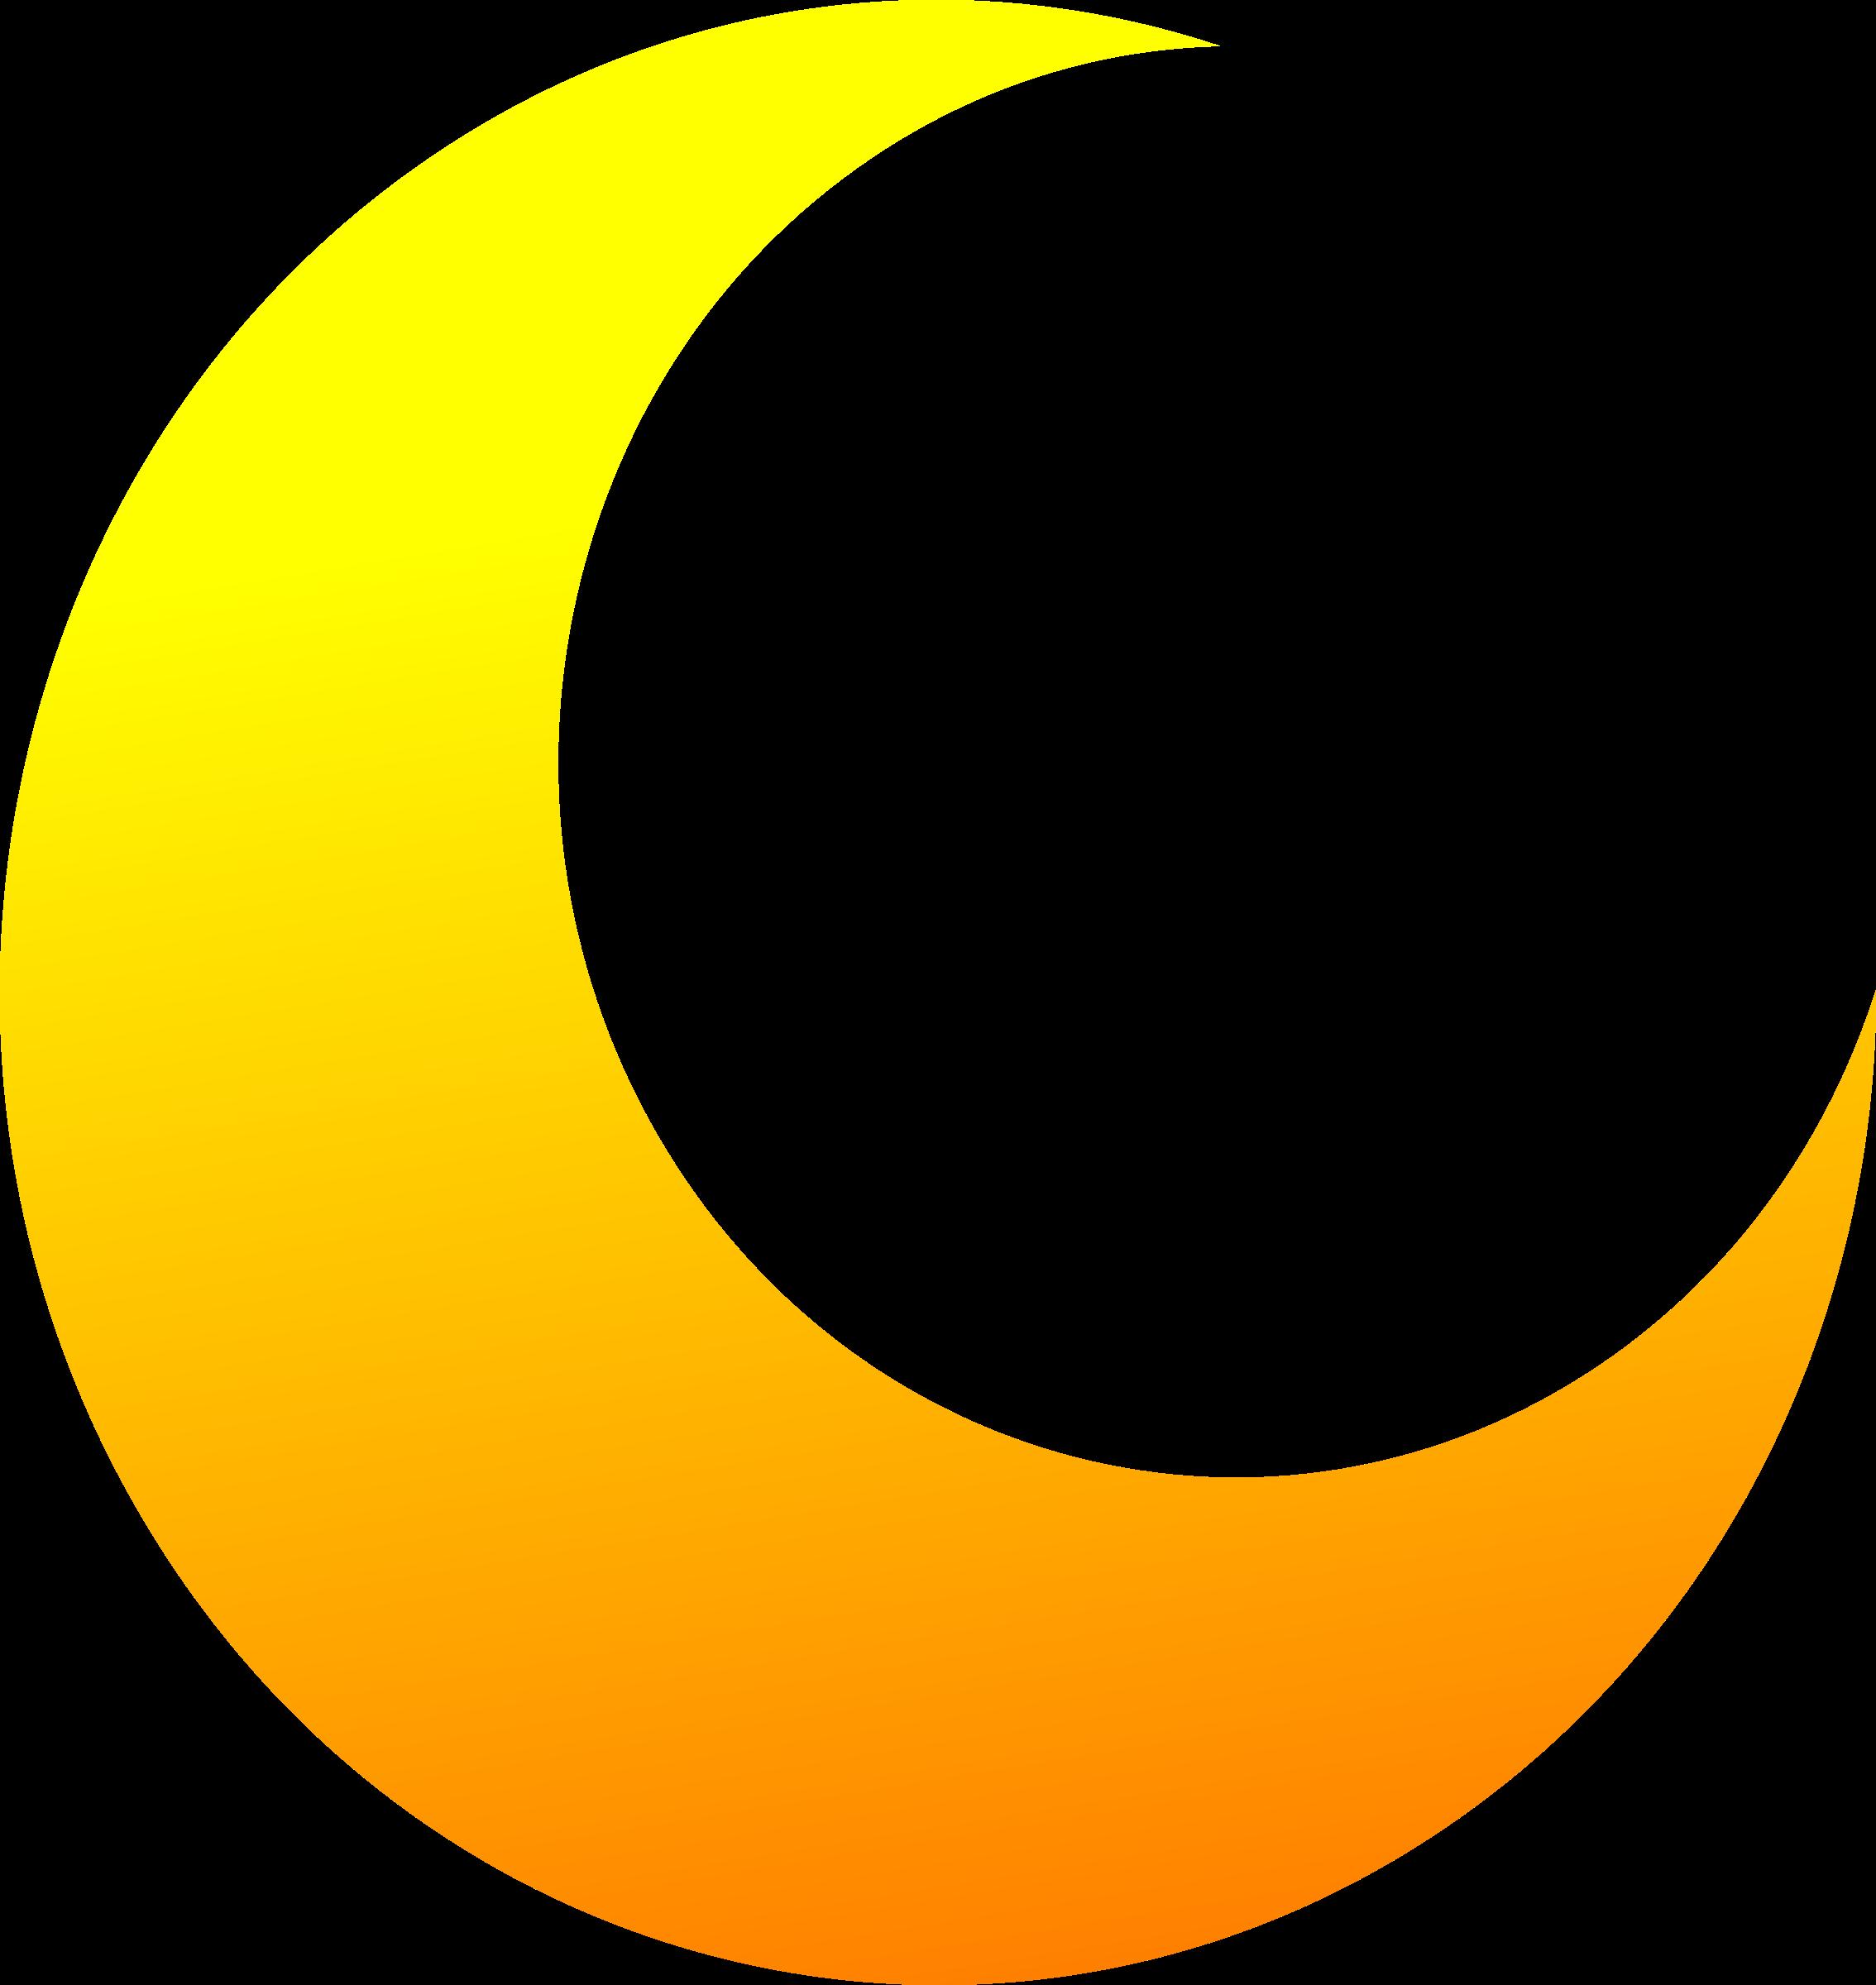 Yellow Crescent Half Moon Vector Clipart.